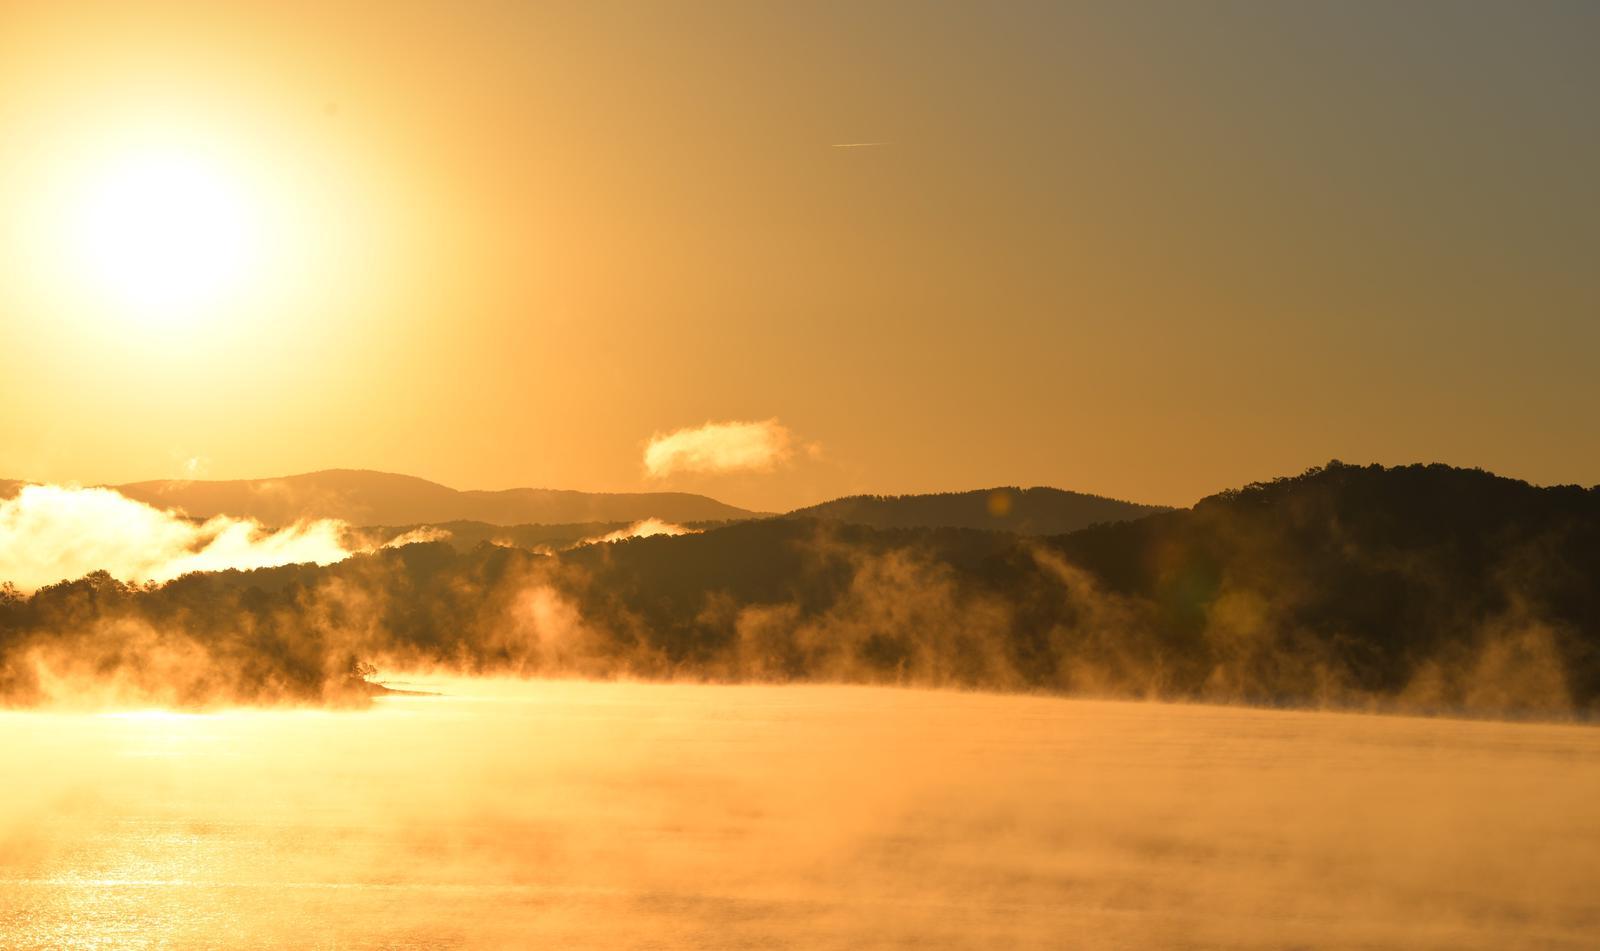 SunriseSunrise over Carters Lake